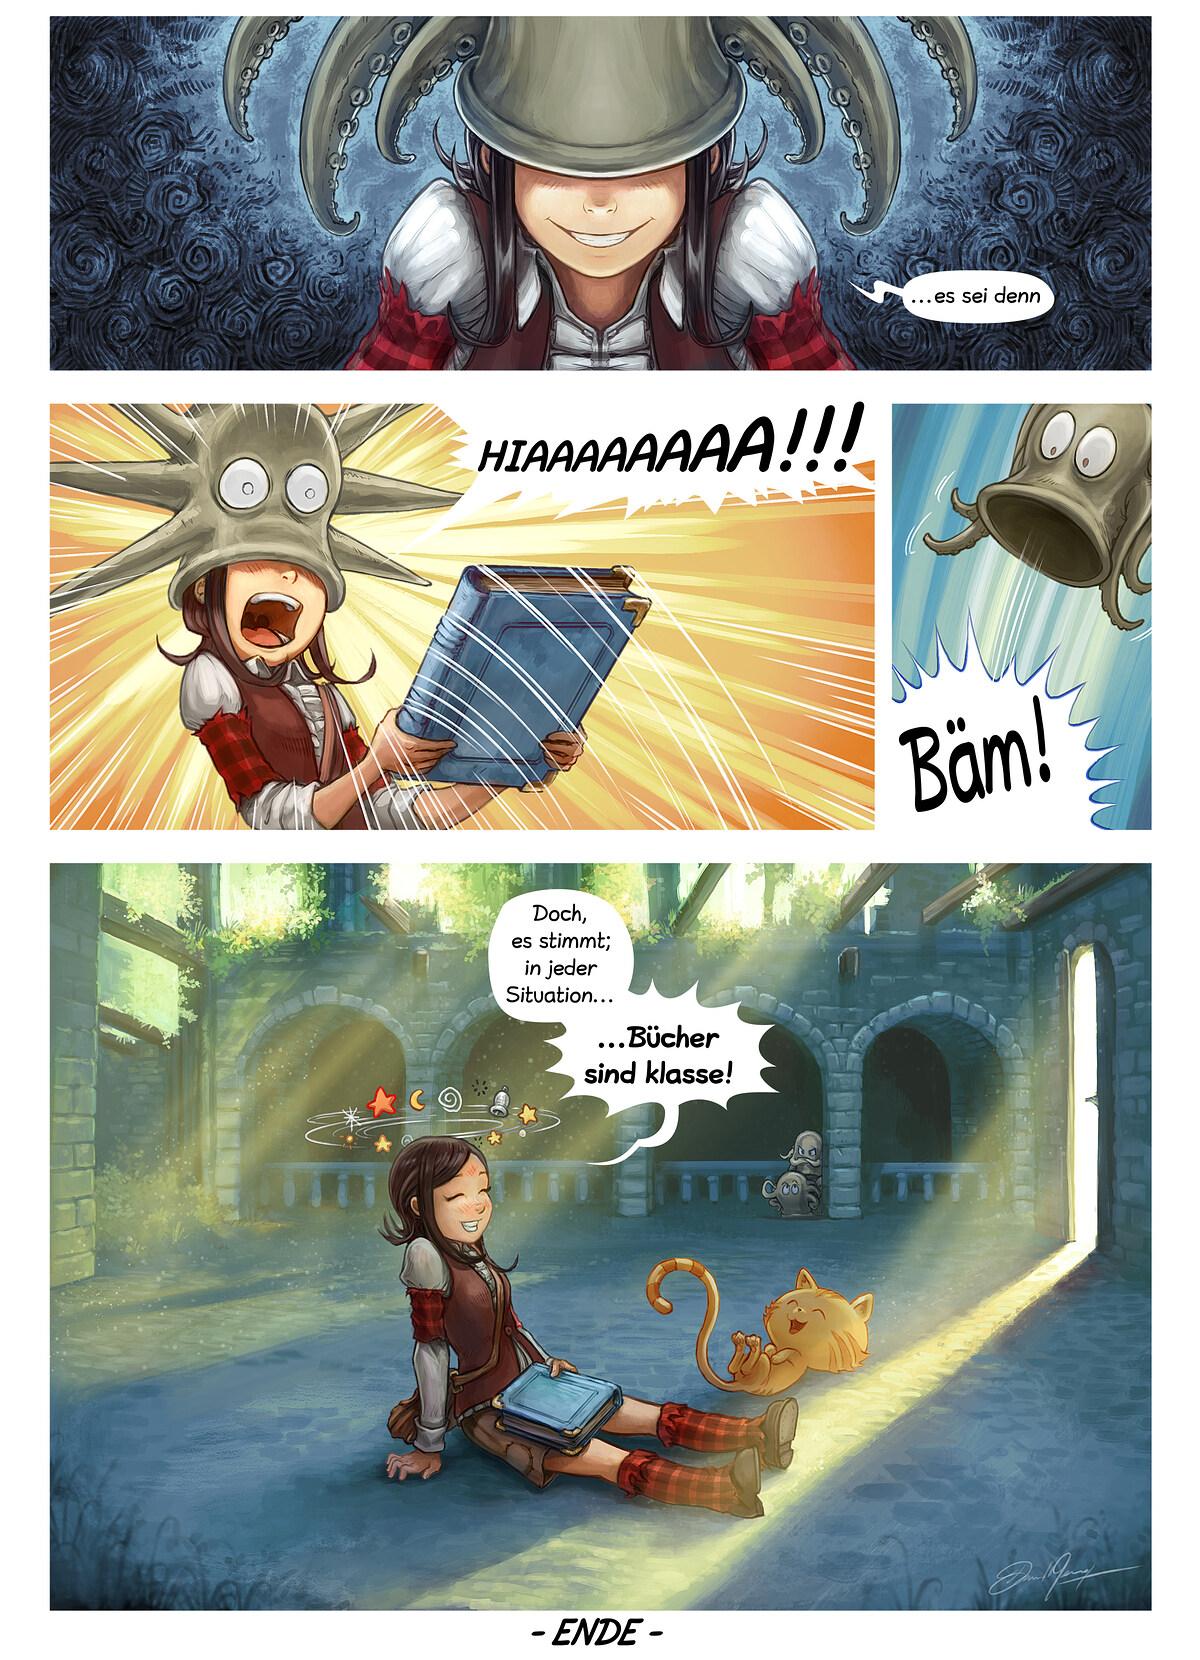 A webcomic page of Pepper&Carrot, Episode 26 [de], Seite 6